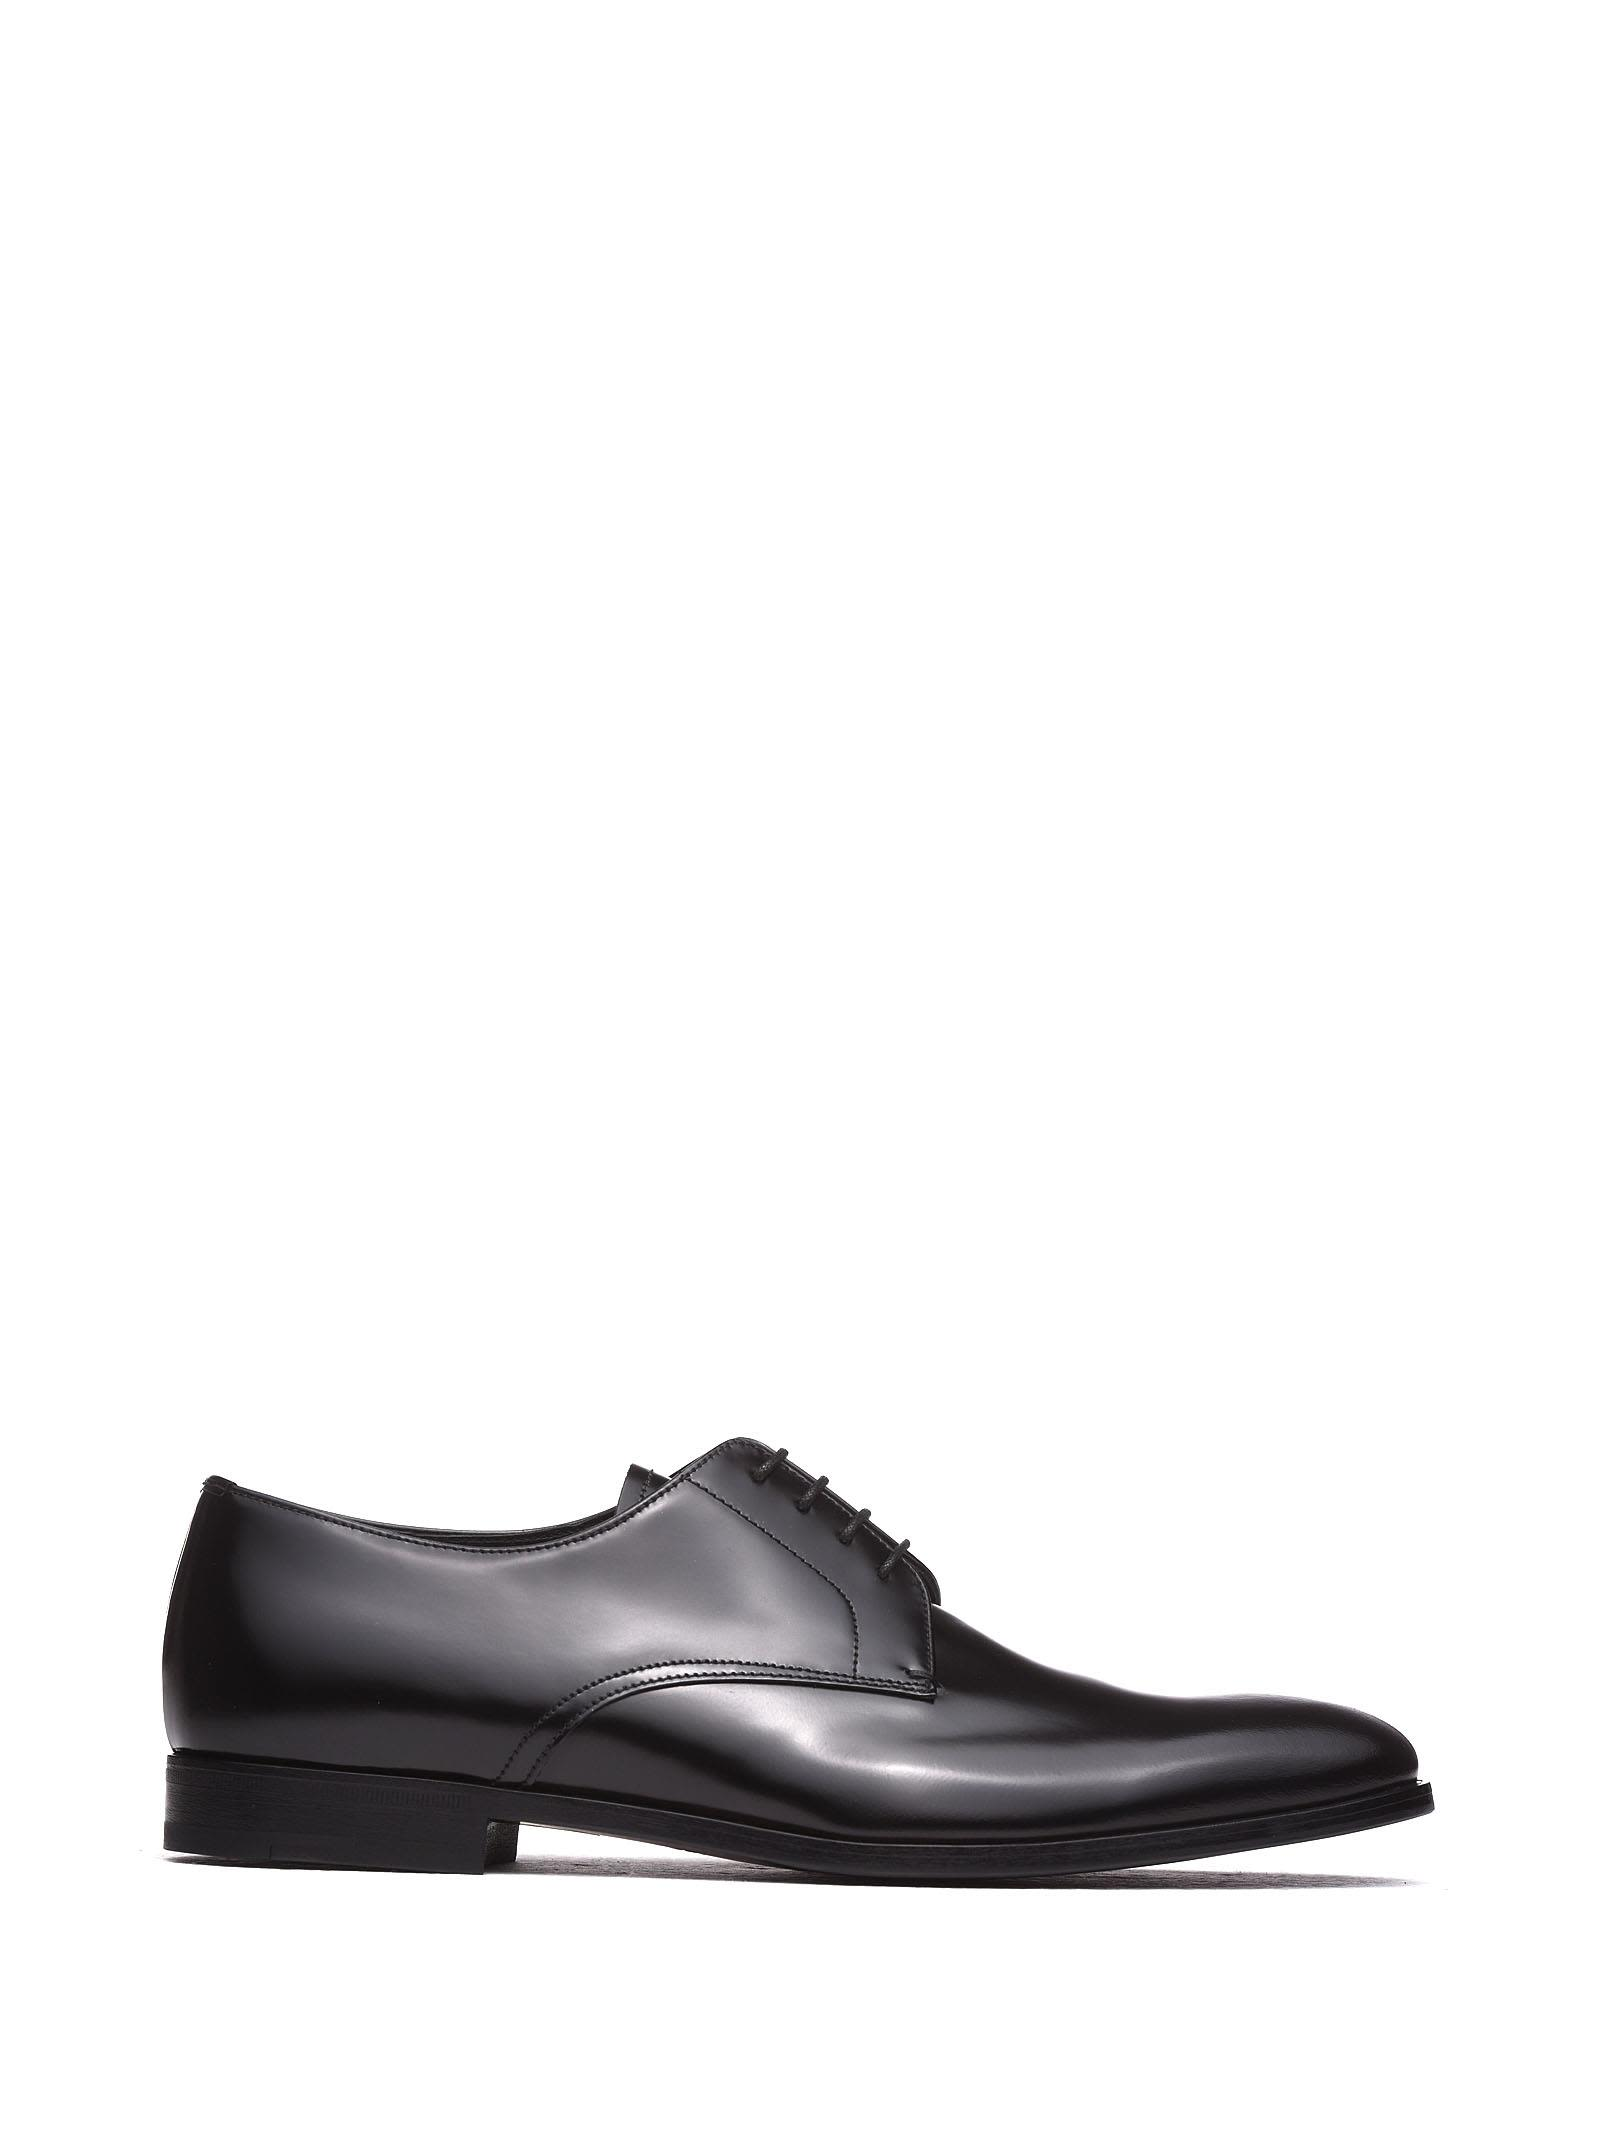 Prada Balck Lace-up Shoes